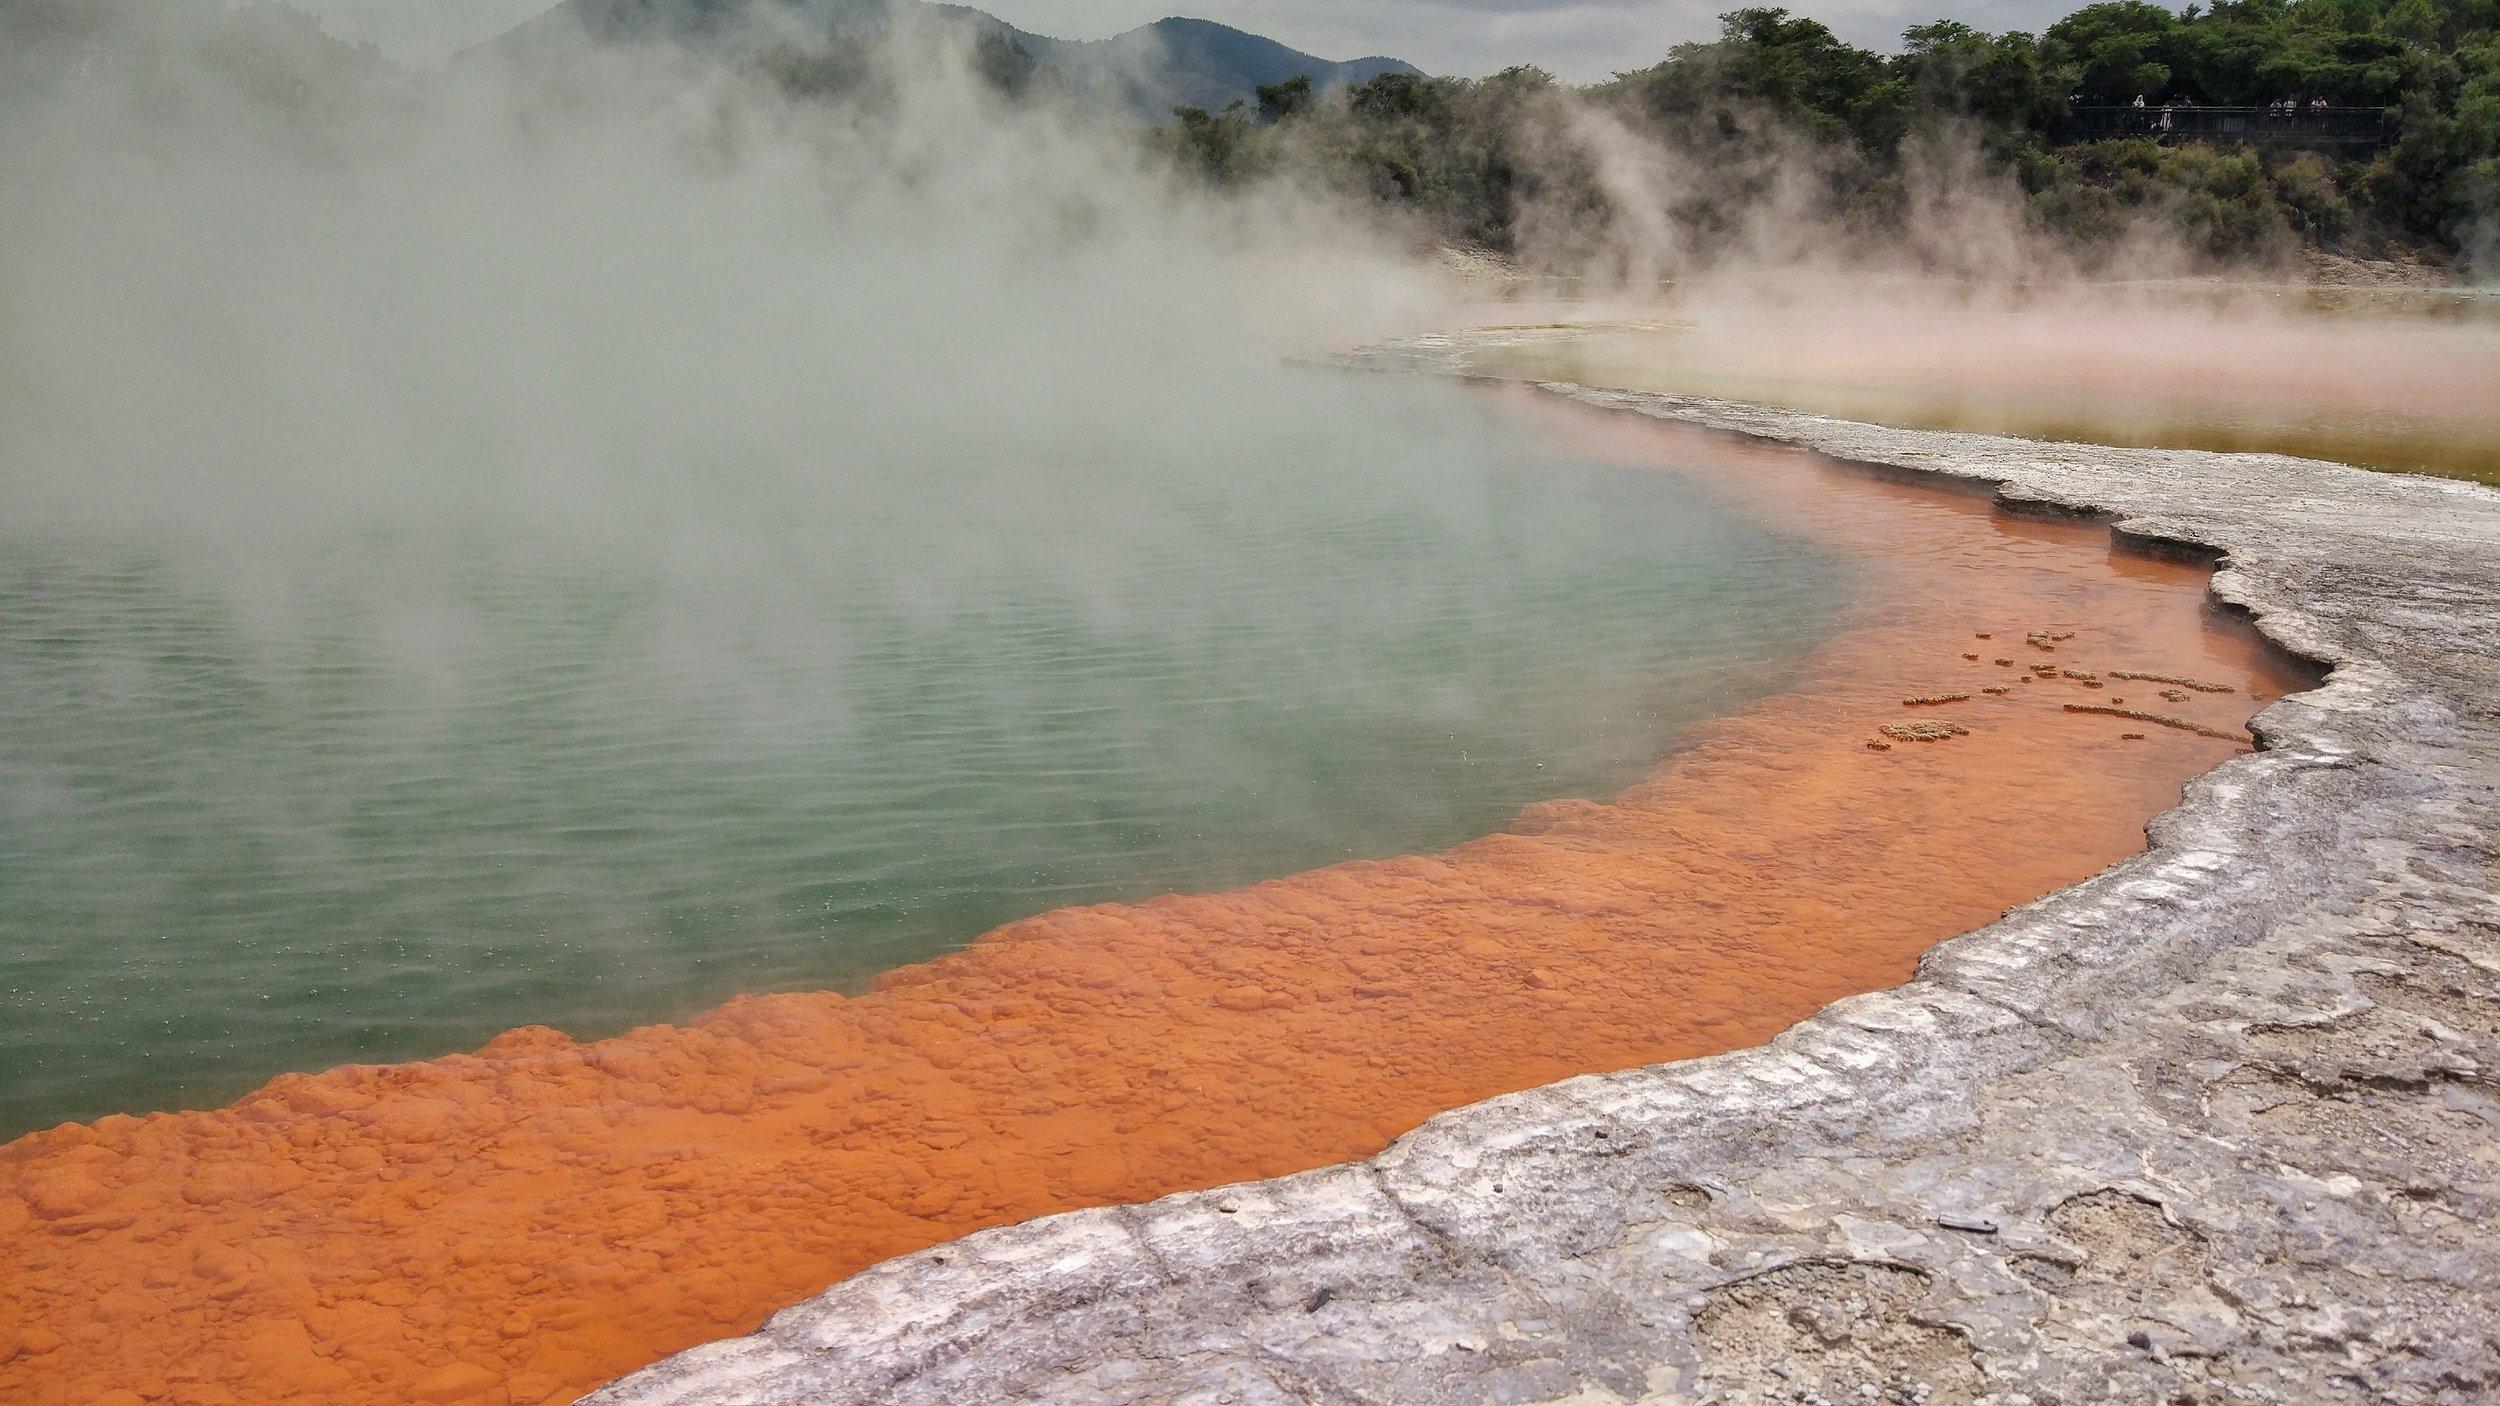 Famous champagne pool in Wai-o-tapu, Rotorura, New Zealand